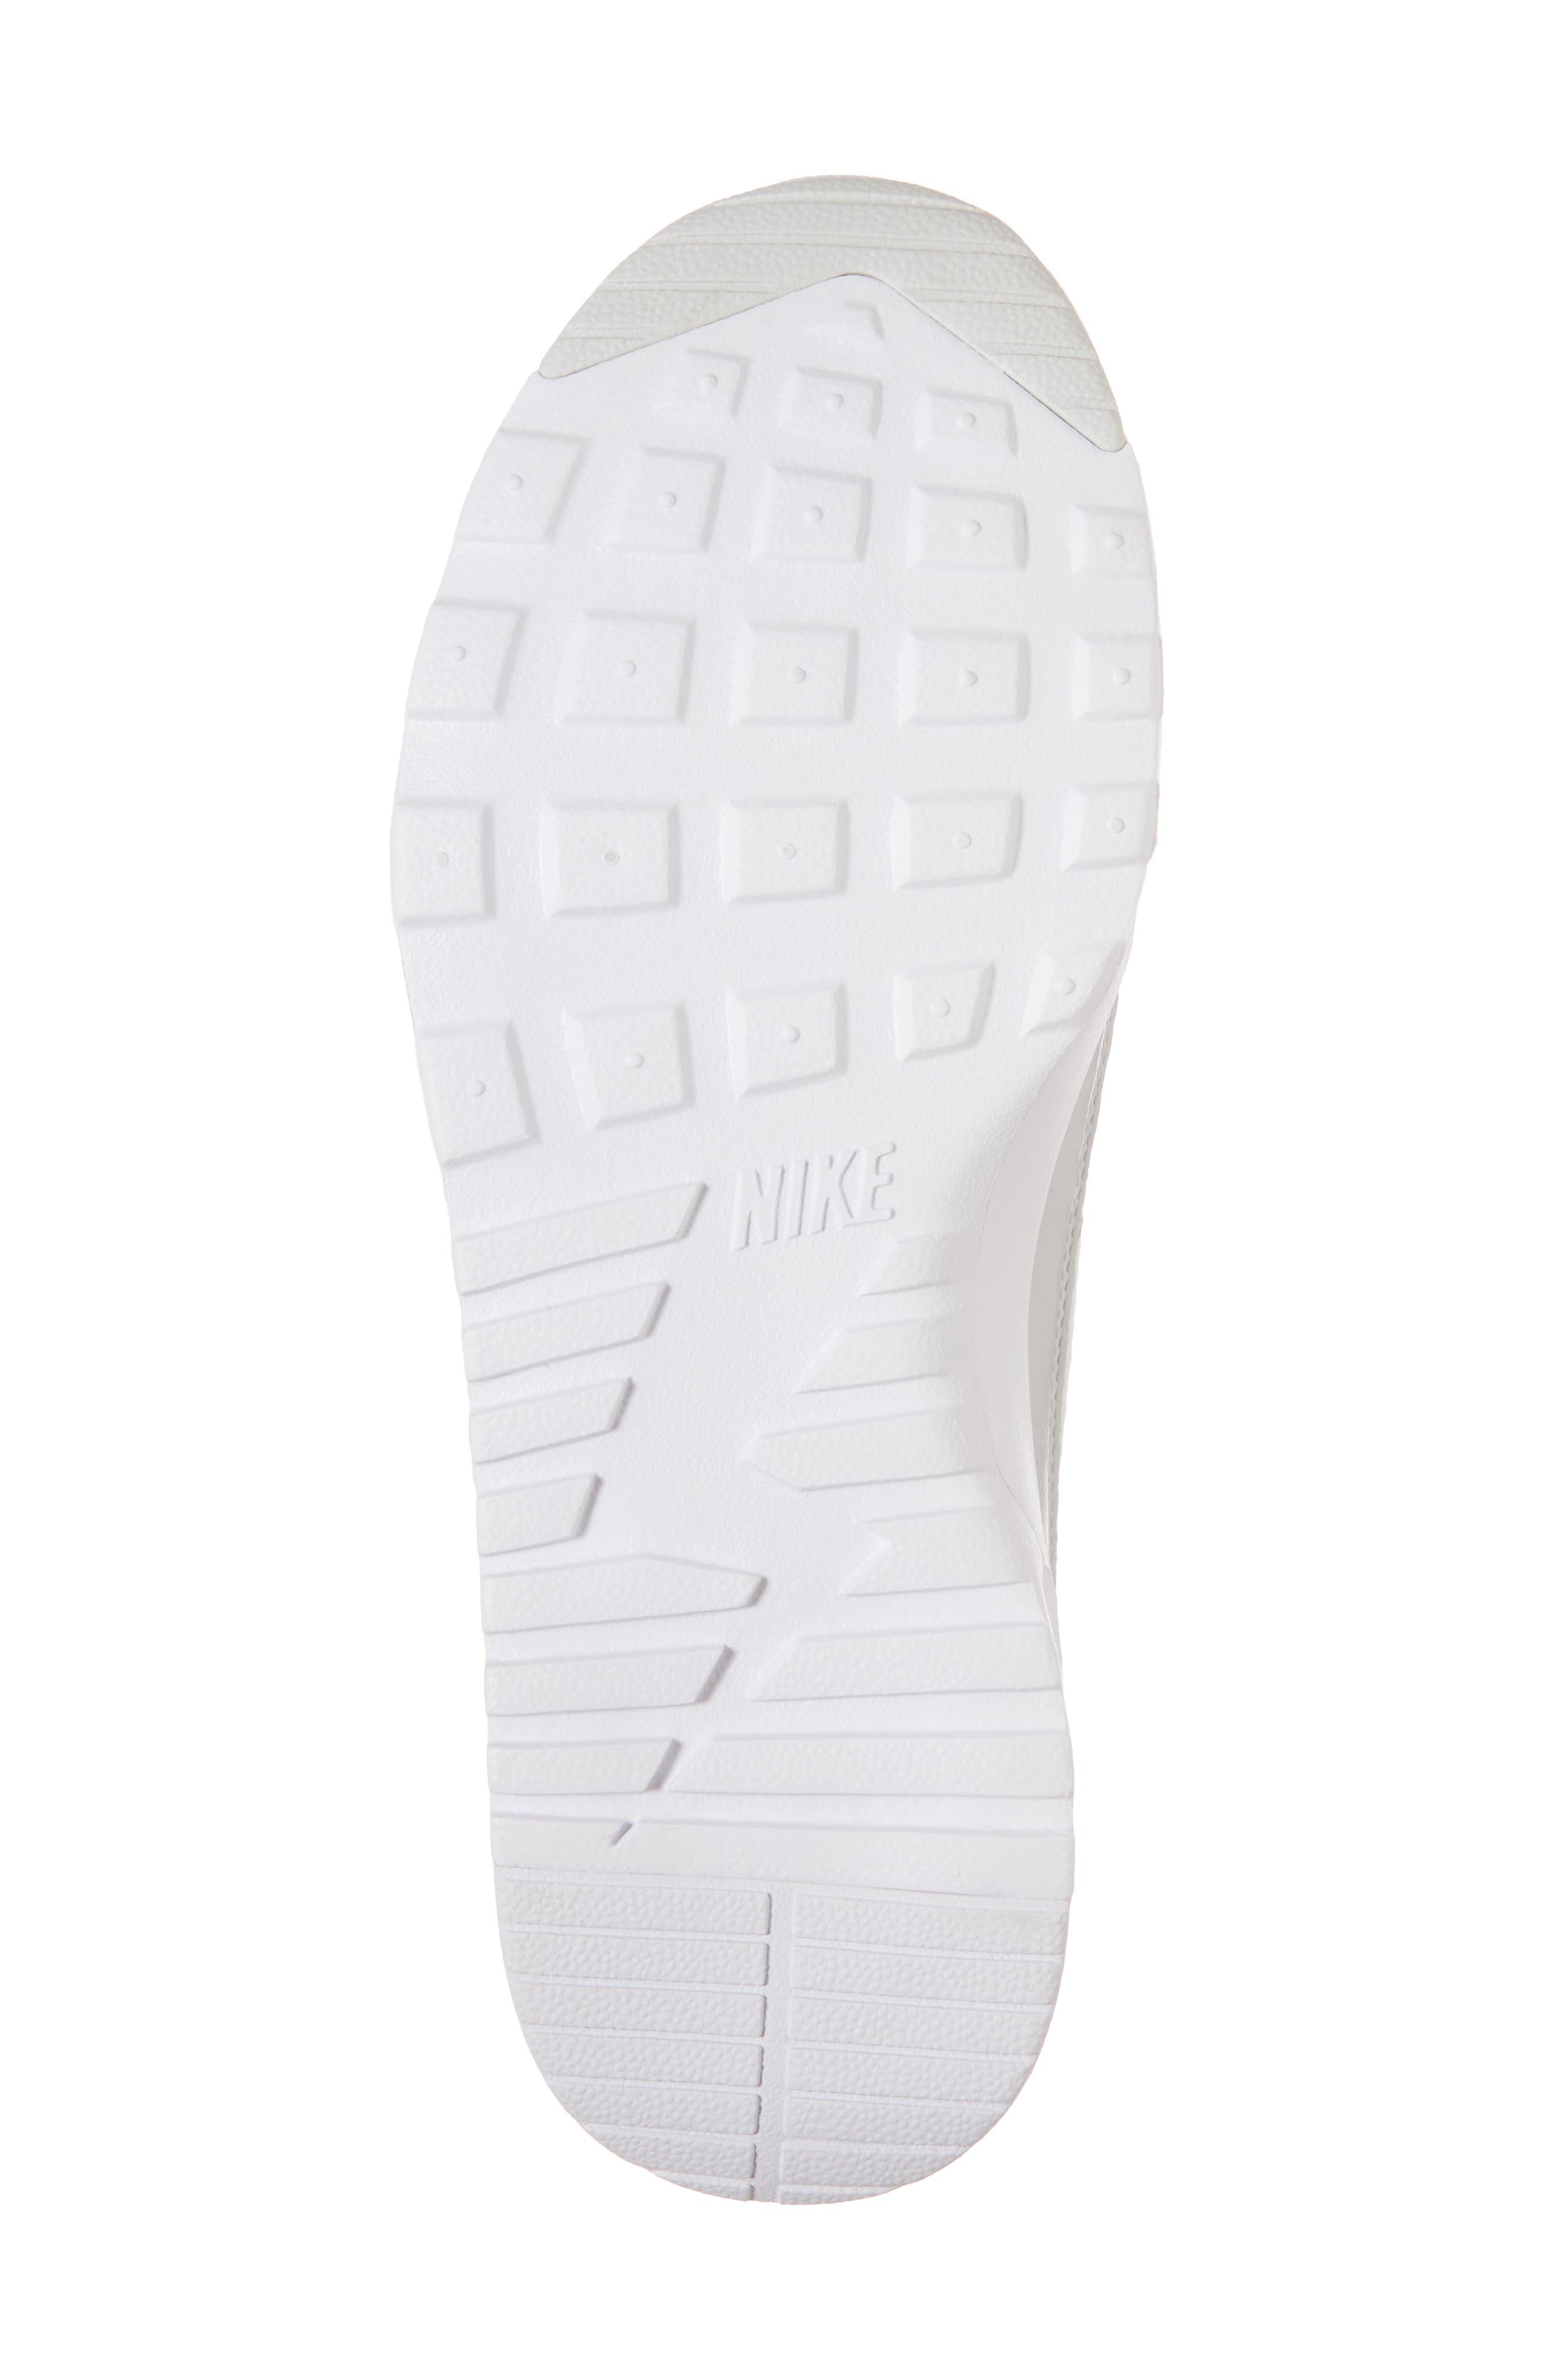 Air Max Thea Sneaker,                             Alternate thumbnail 6, color,                             ATMOSPHERE GREY/ WHITE